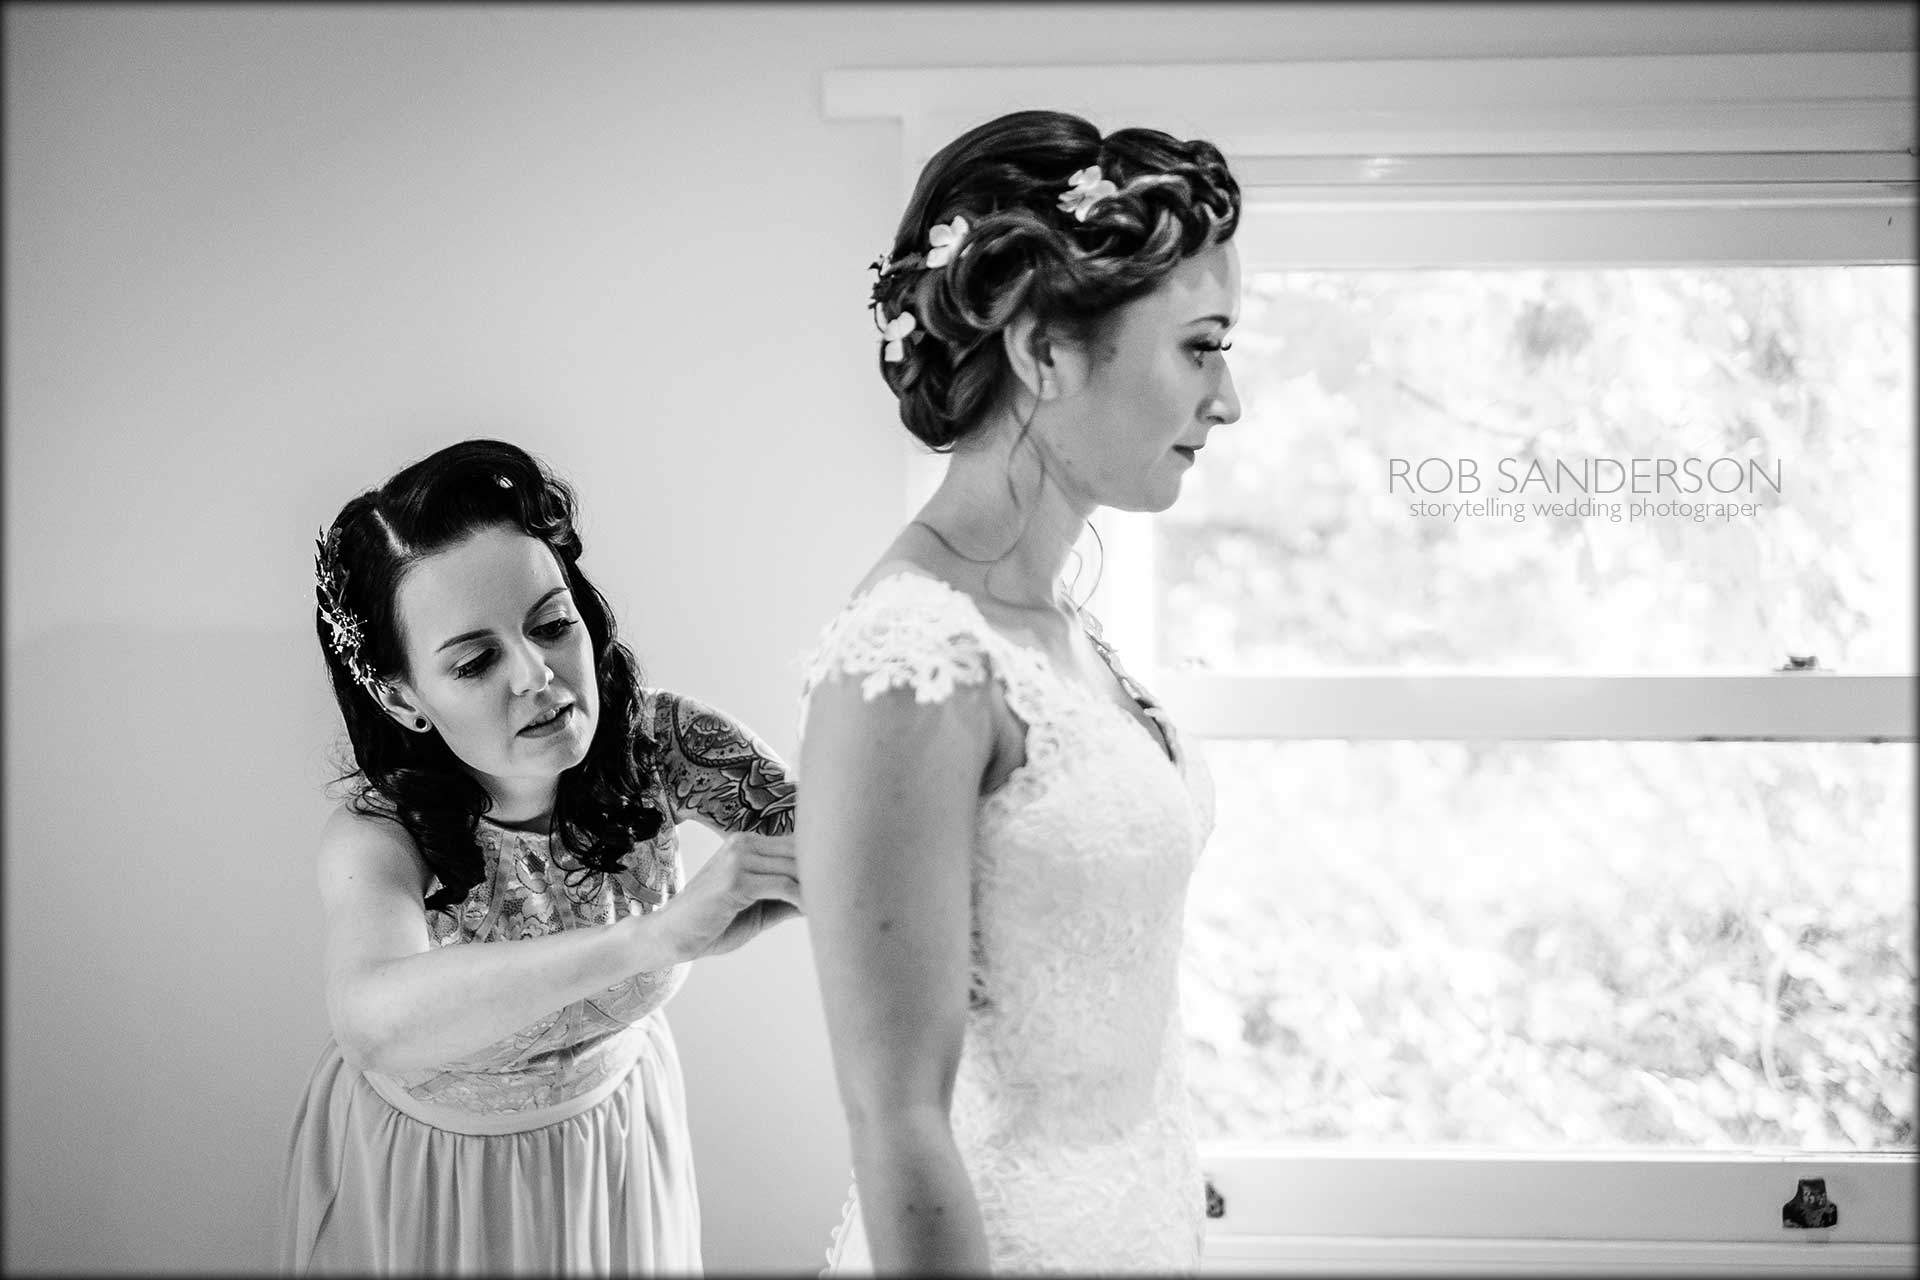 putting on her wedding dress